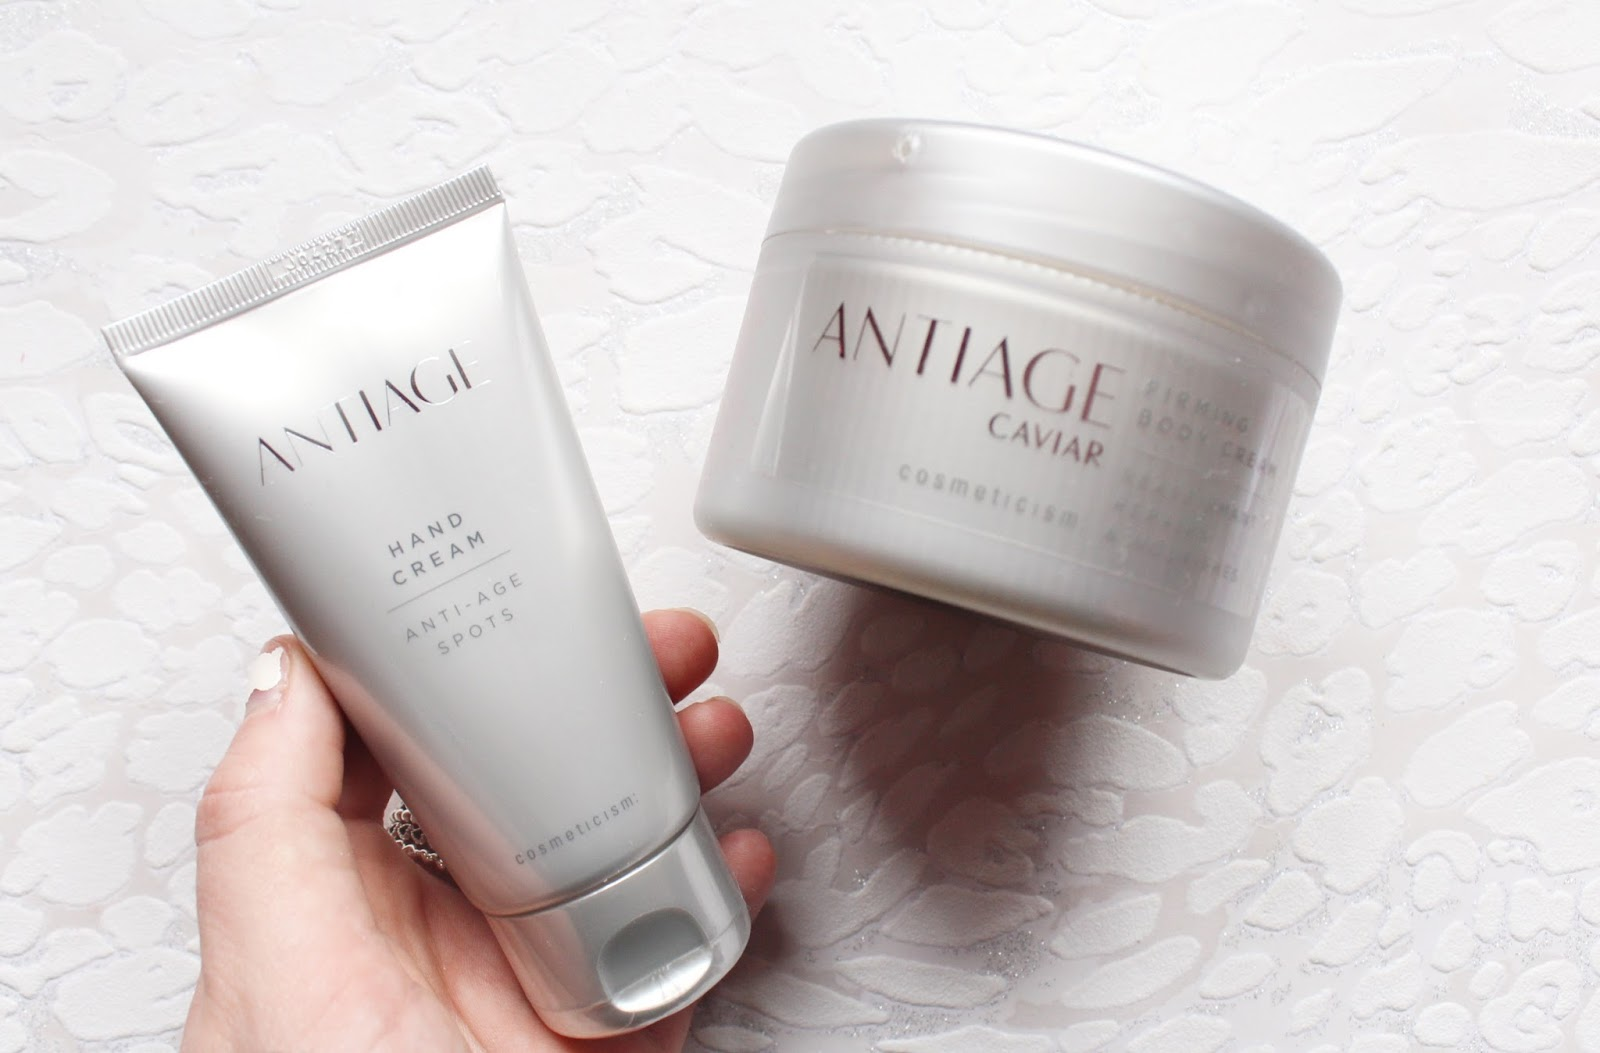 Tesco Anti-Ageing Caviar Skincare & Bodycare